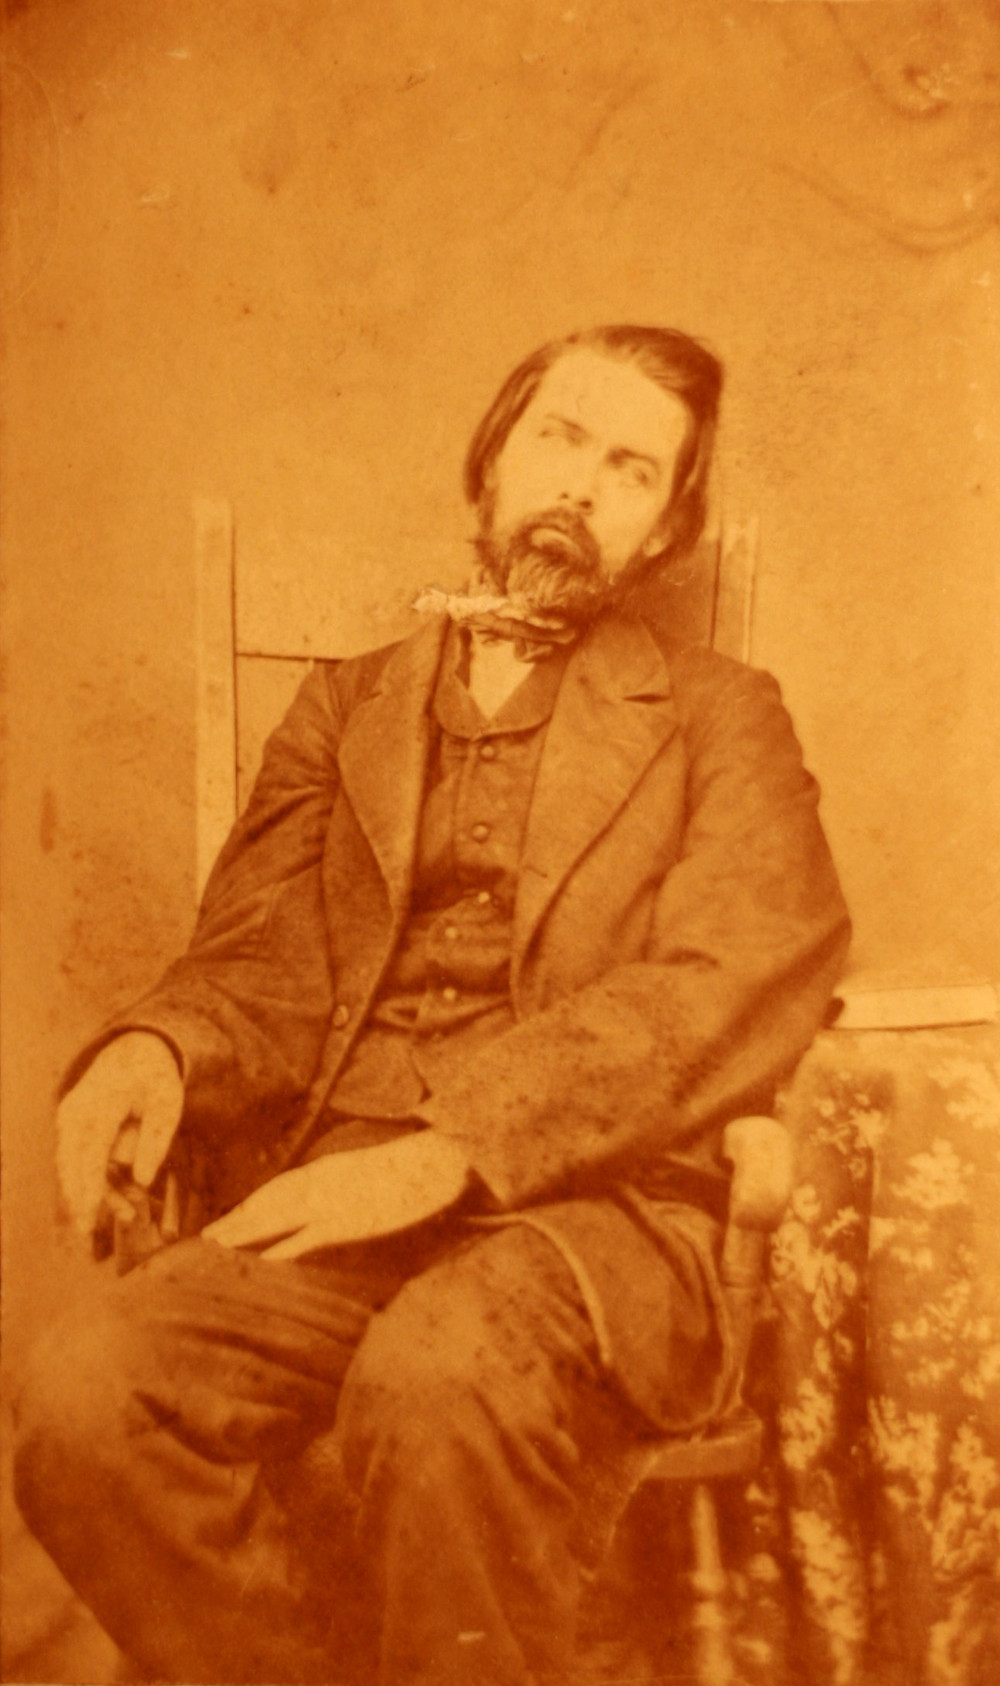 Photo courtesy of Wikimedia: https://commons.wikimedia.org/wiki/File%3APostmortem_man.jpg